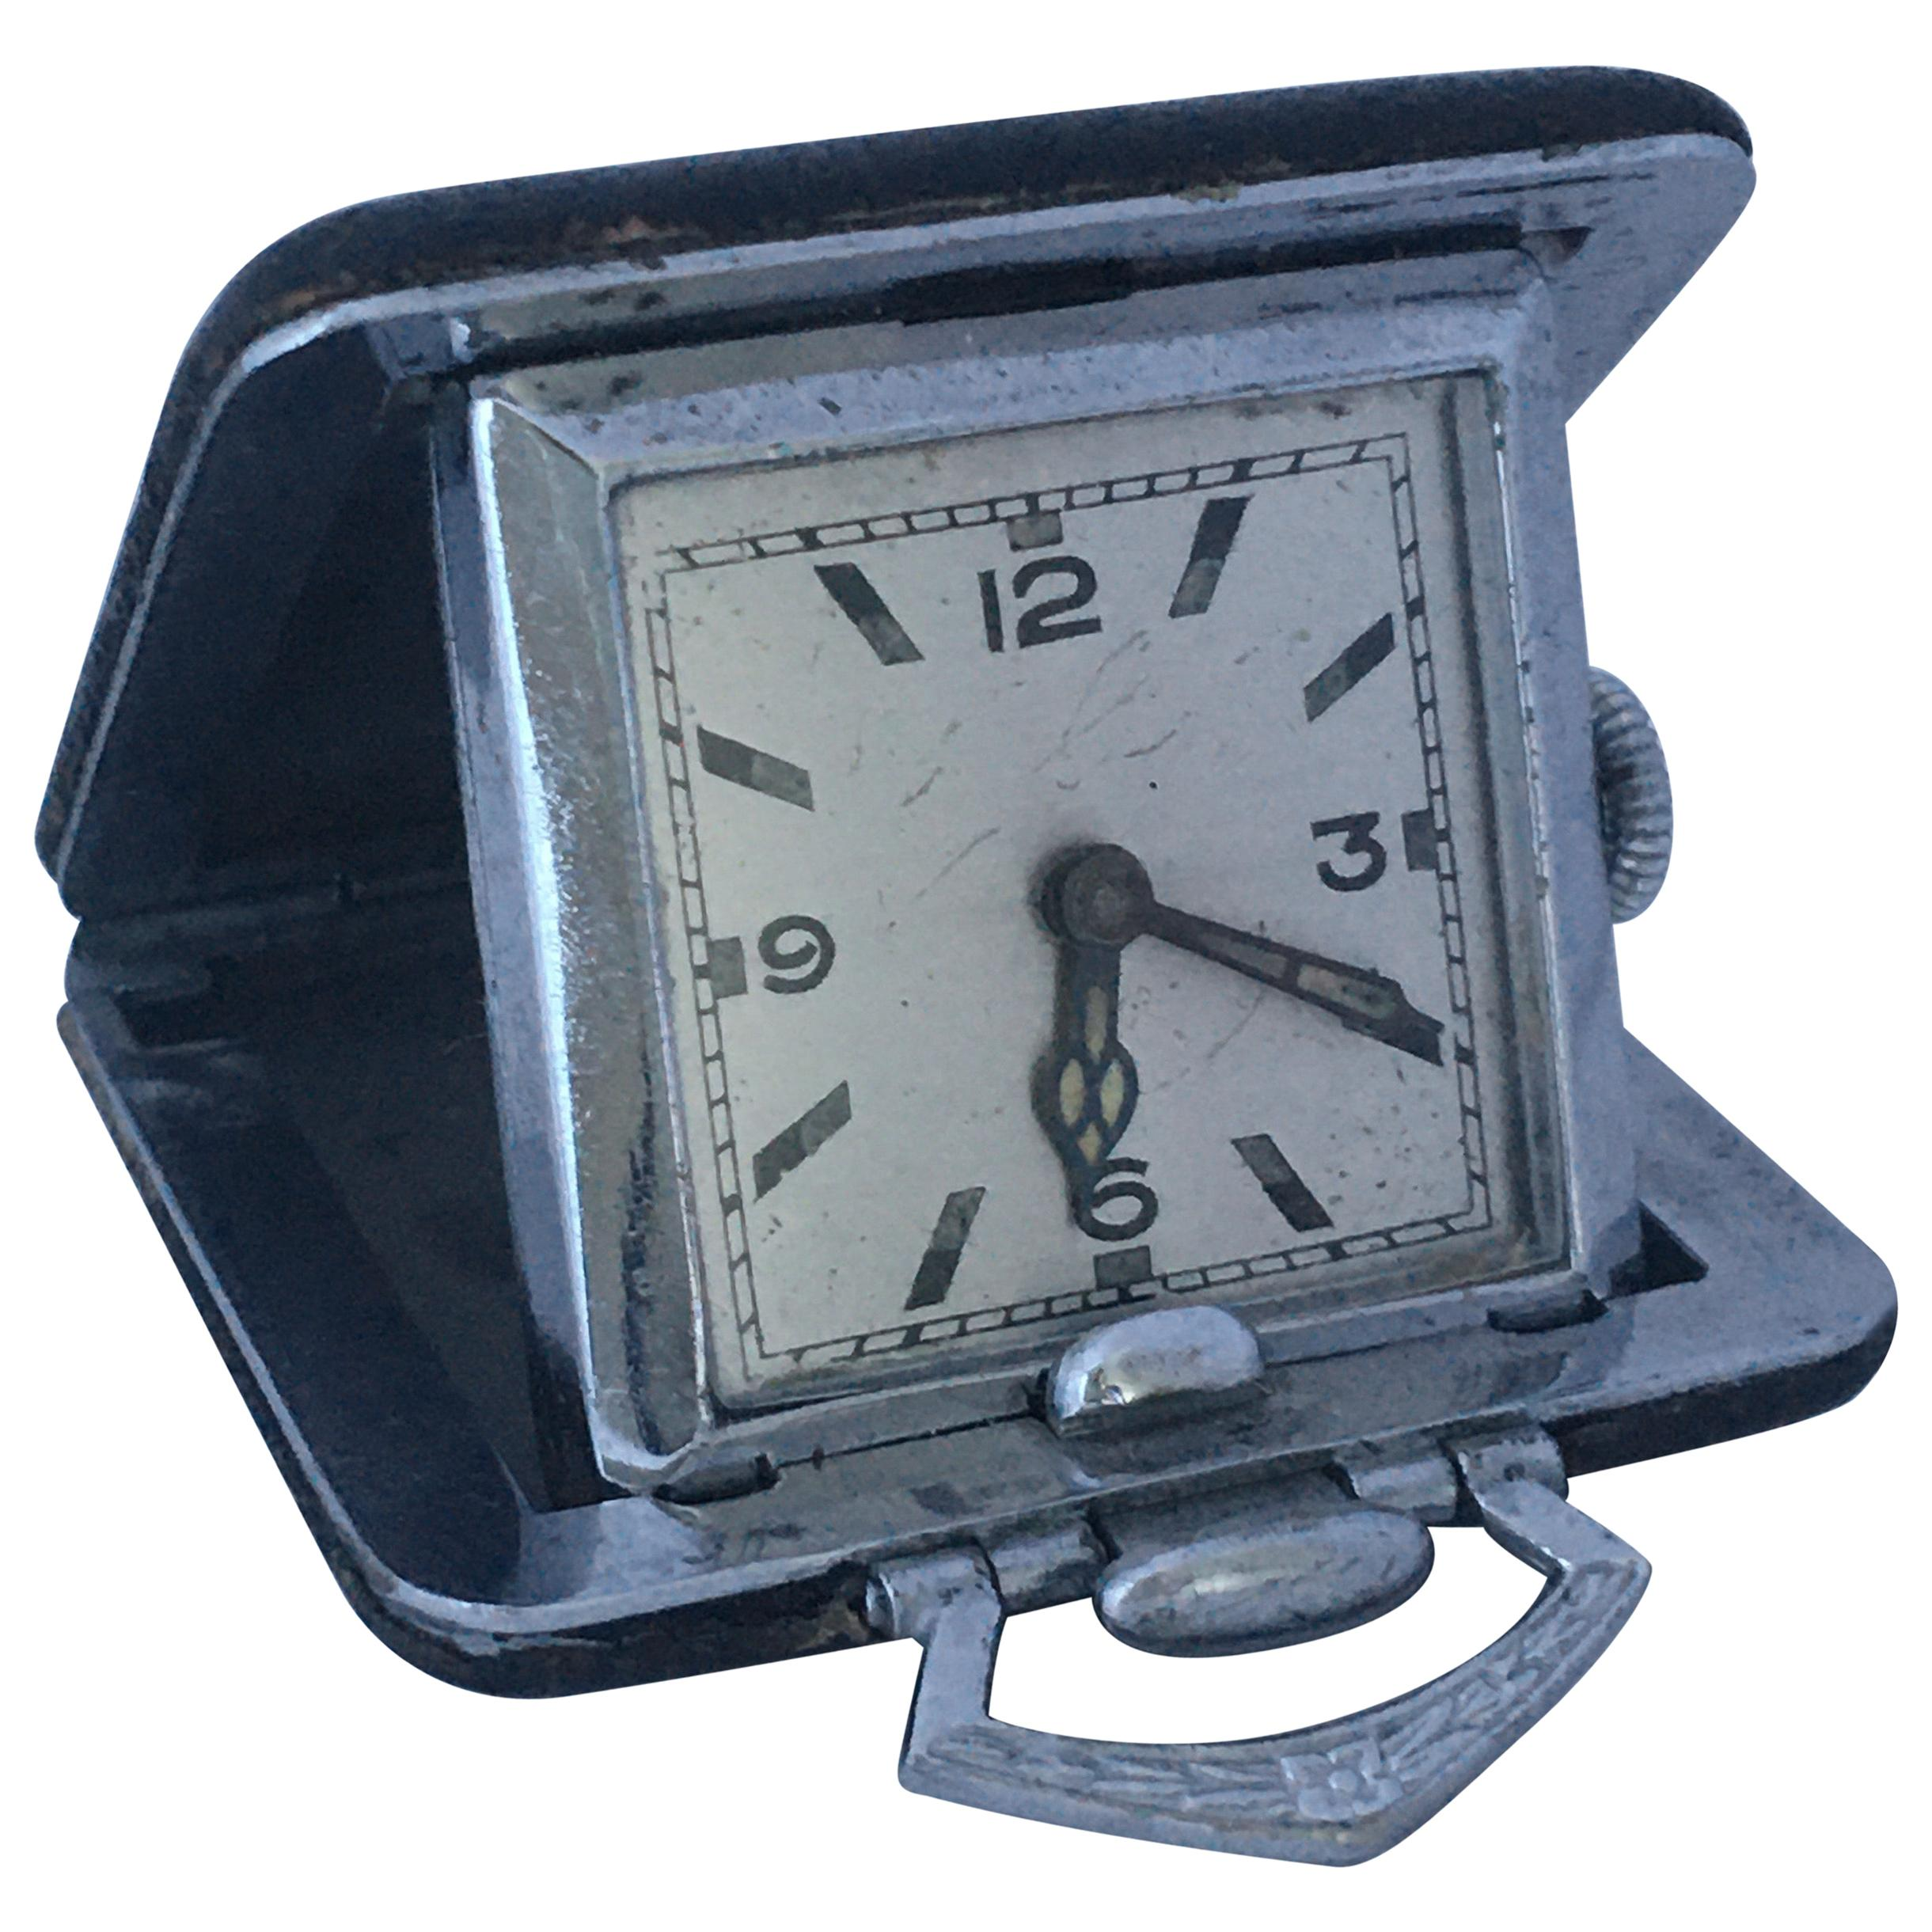 Vintage Miniature Mechanical Travel Clock